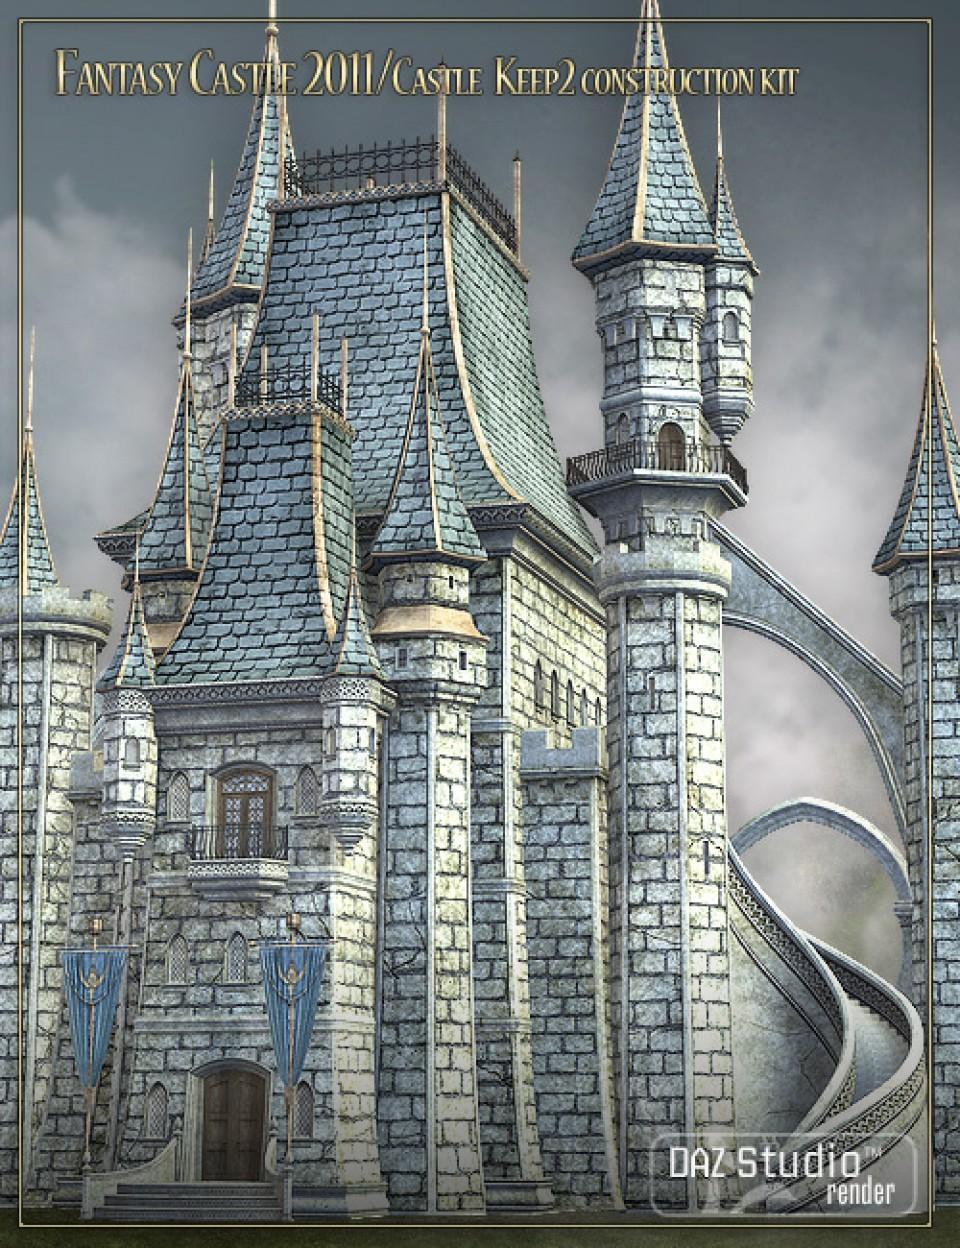 Fantasy Castle 2011 - Castle Keep 2